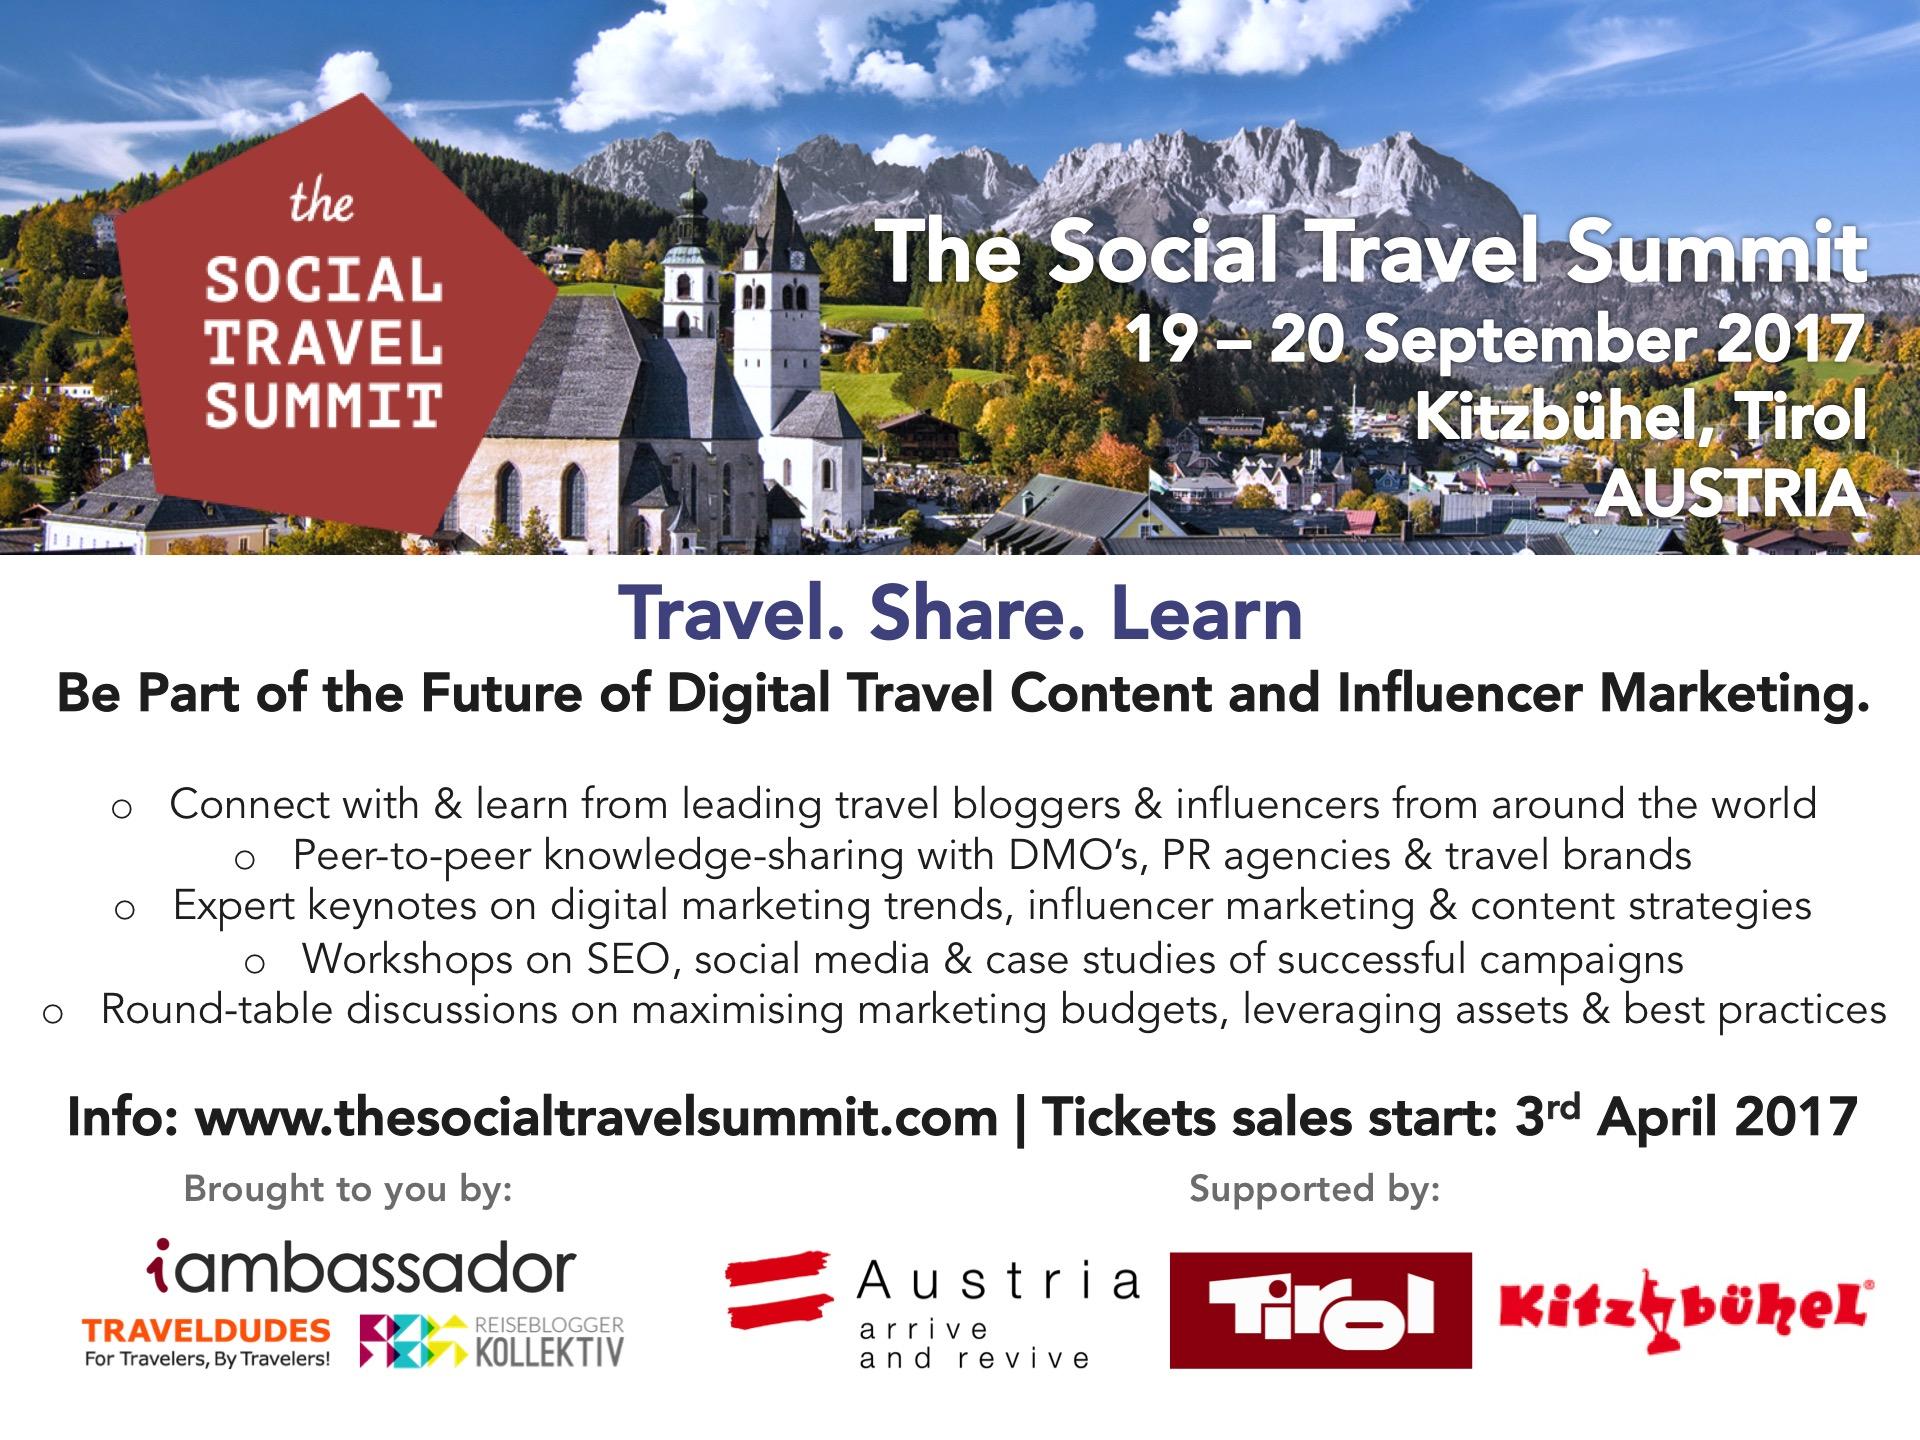 The Social Travel Summit 2017 Goes To Kitzbühel Austria The